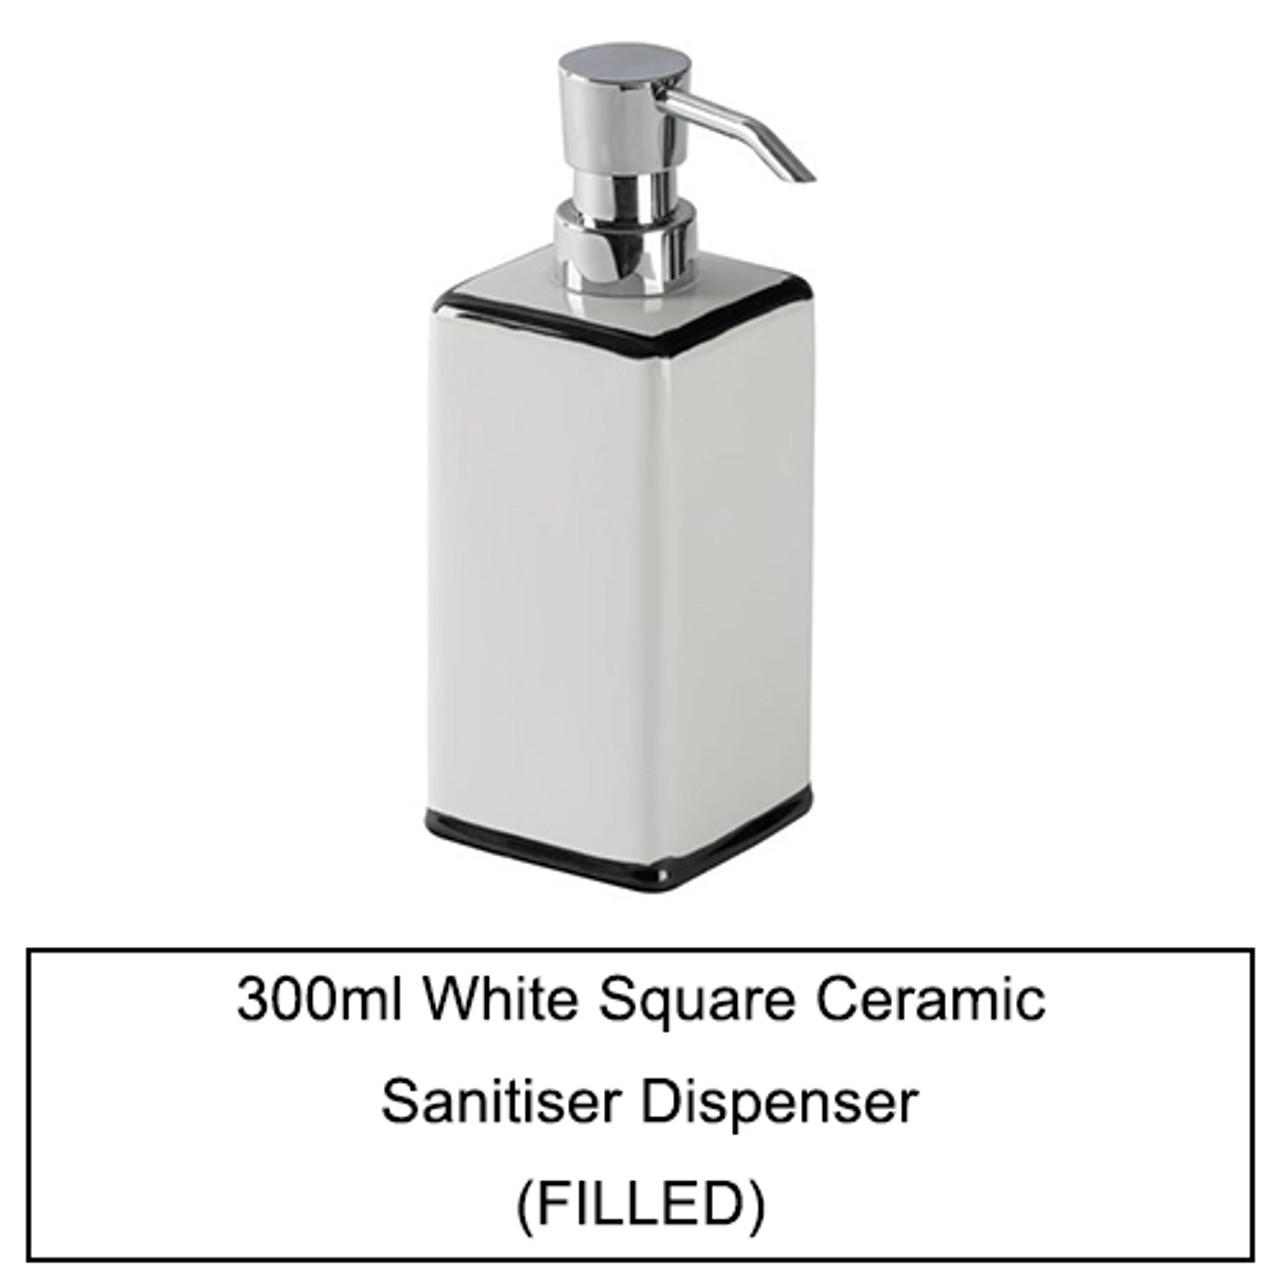 280ml - 300ml Manual Pump Ceramic Sanitiser Dispensers (Filled)